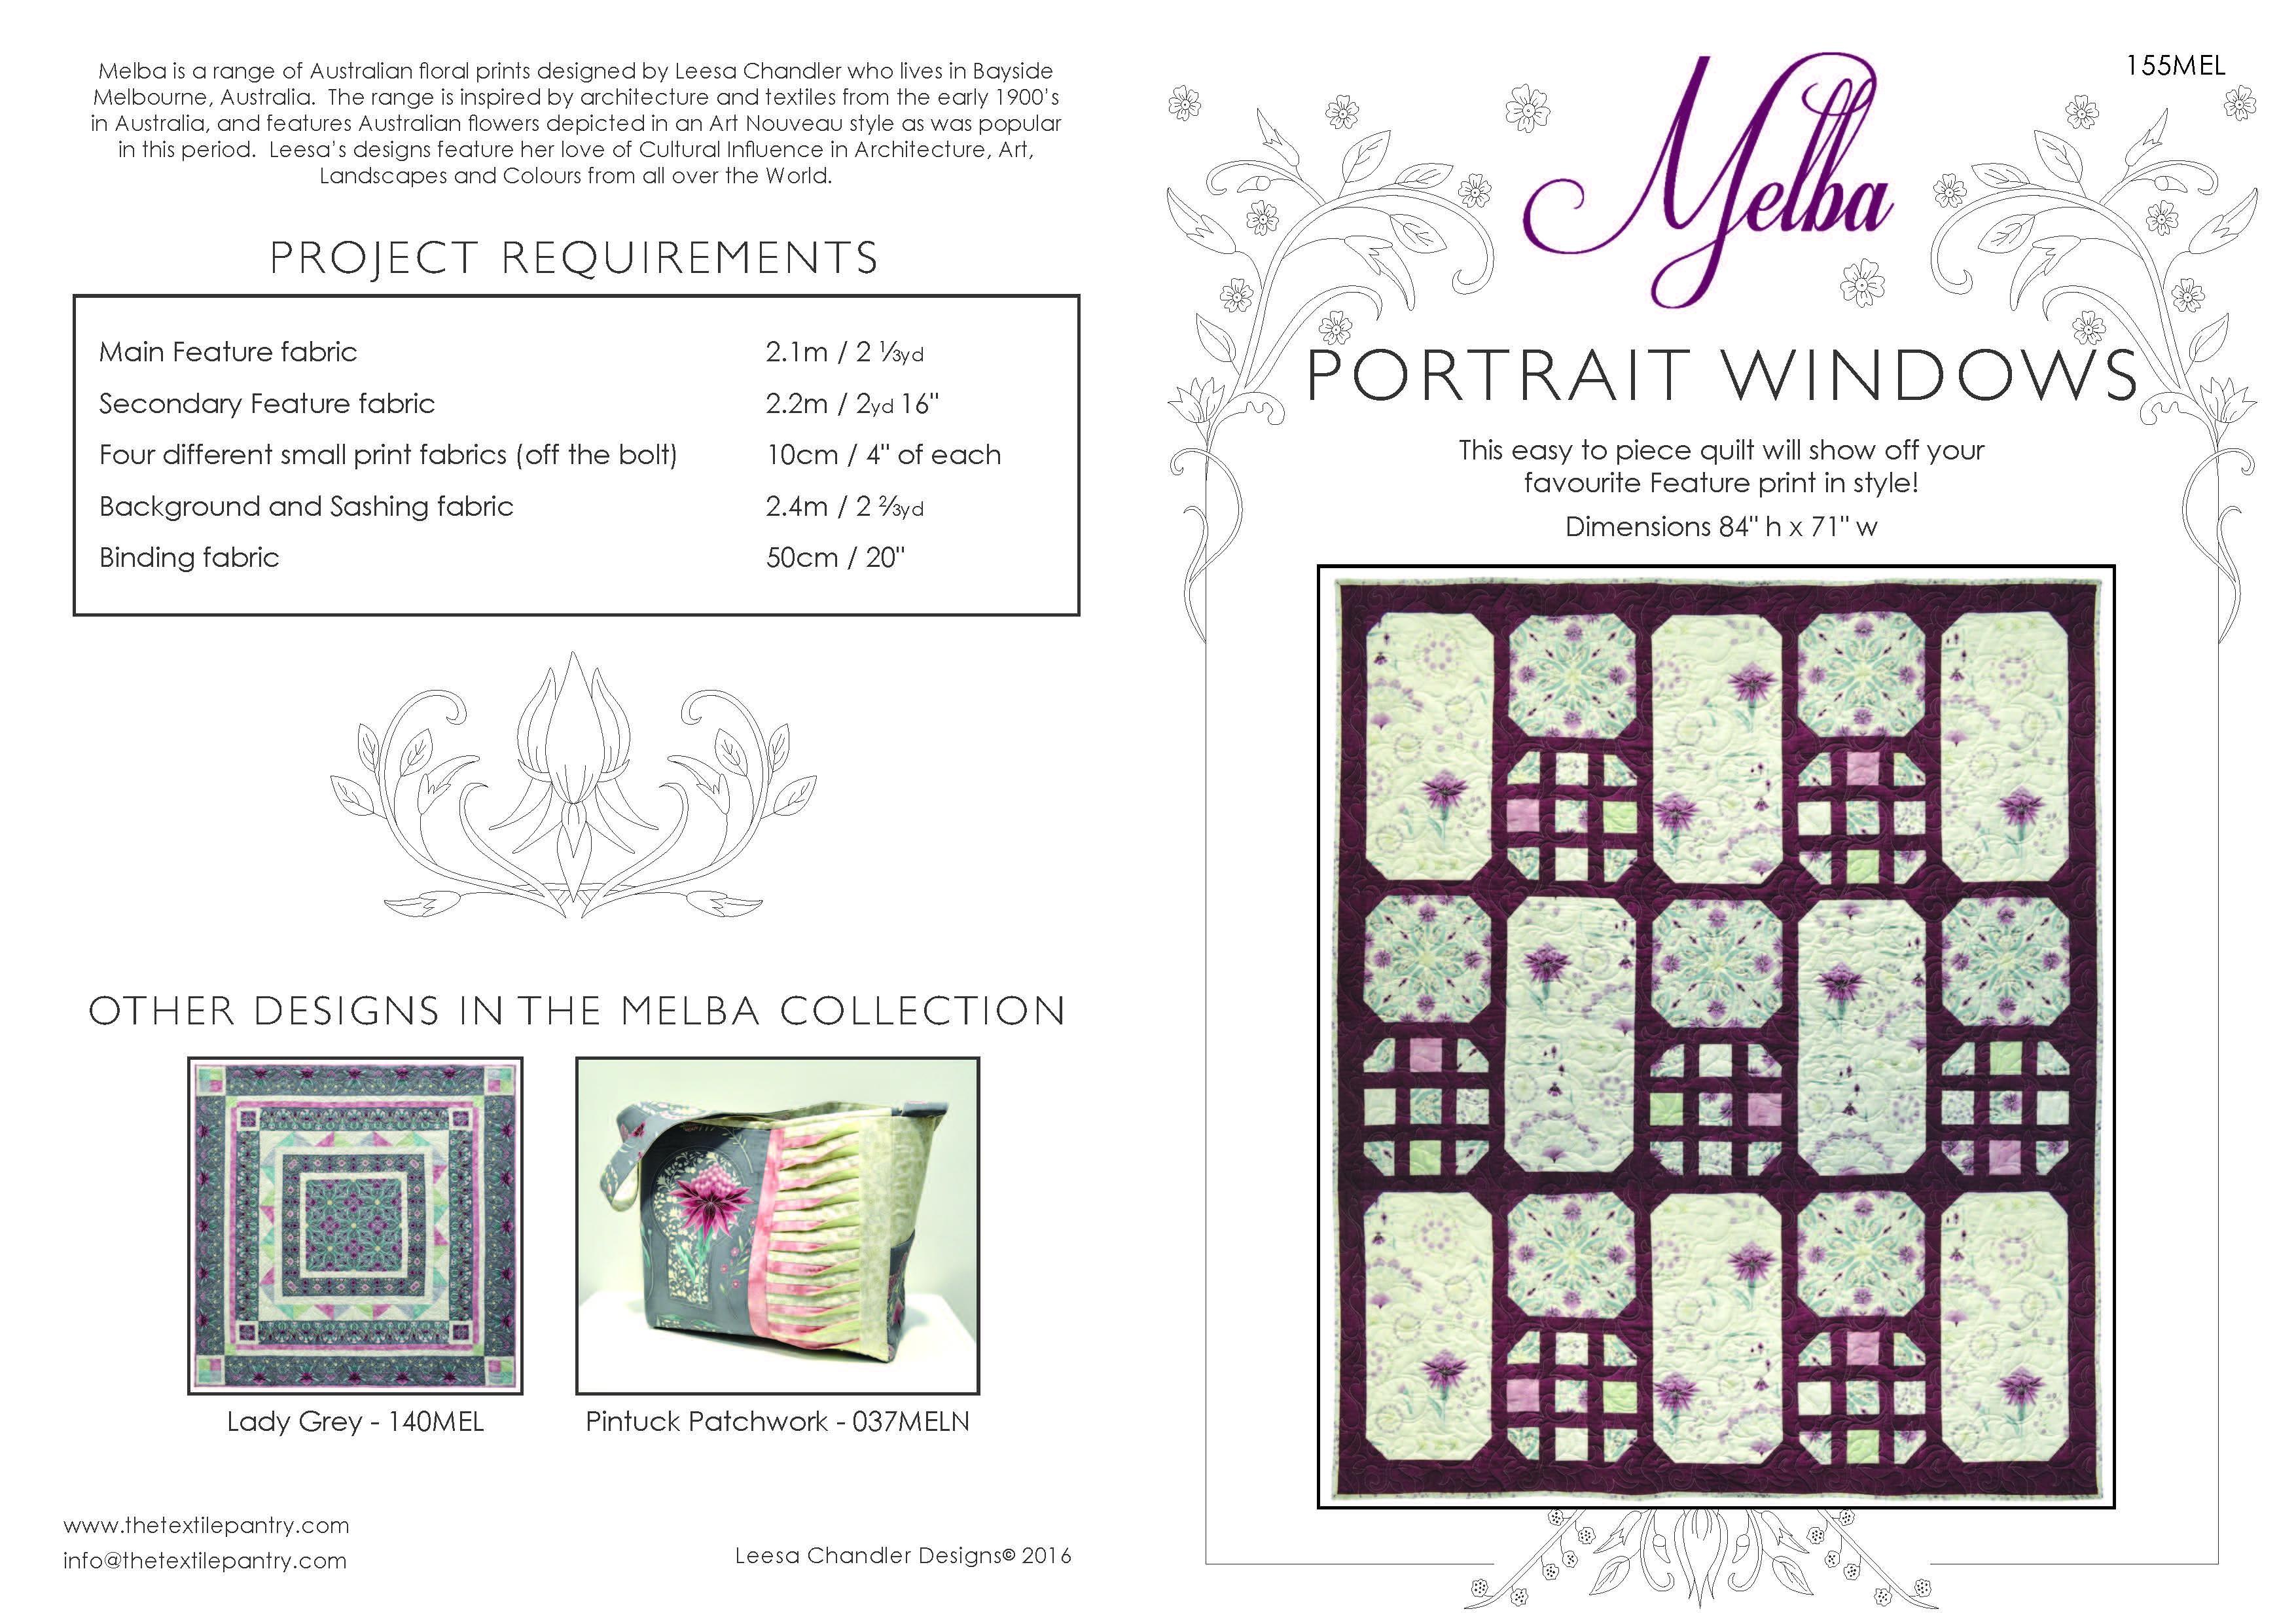 Portrait Windows - 155MEL